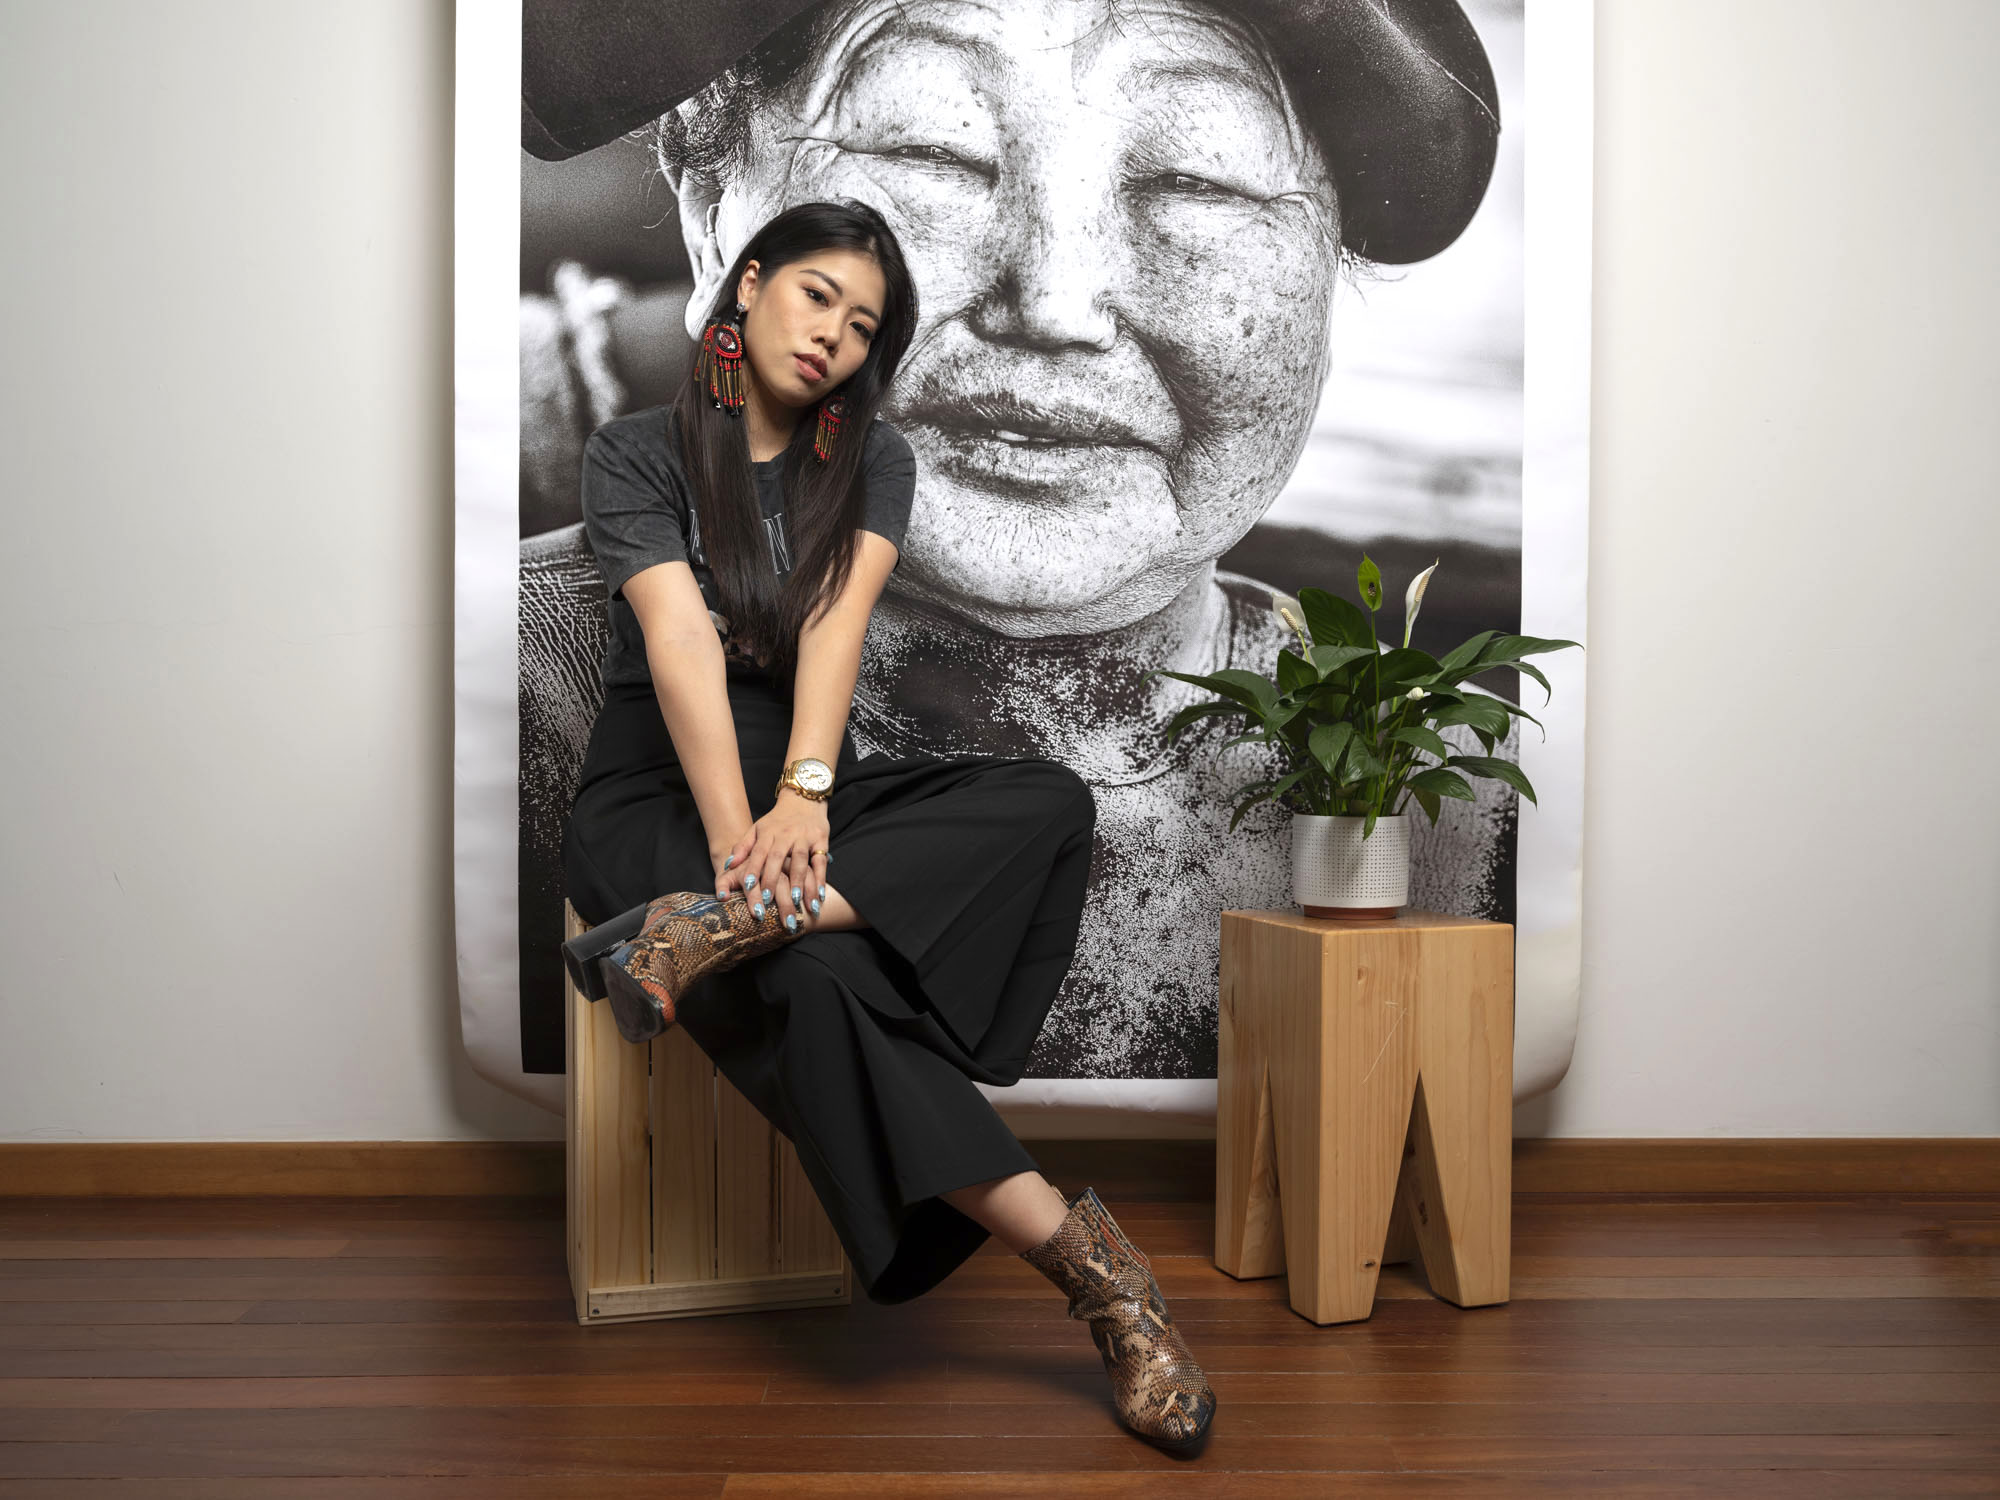 Portrait Photography Singapore Lifestyle Coco Creative Studio 12127